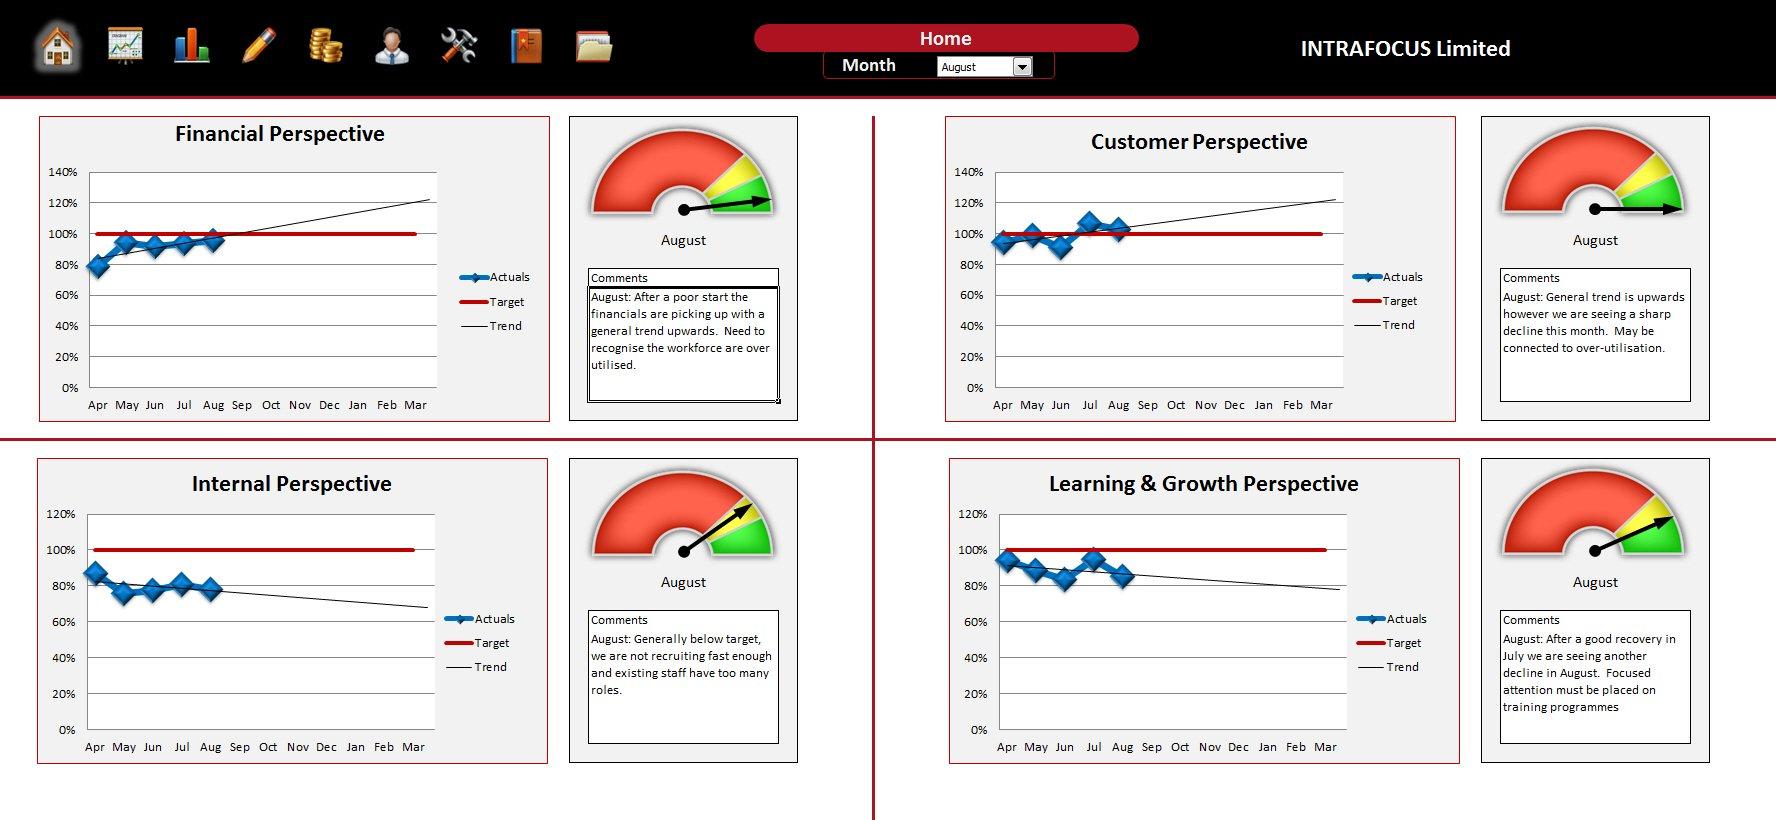 Blank Kpi Scorecard Template Excel With Kpi Scorecard Template Excel In Workshhet